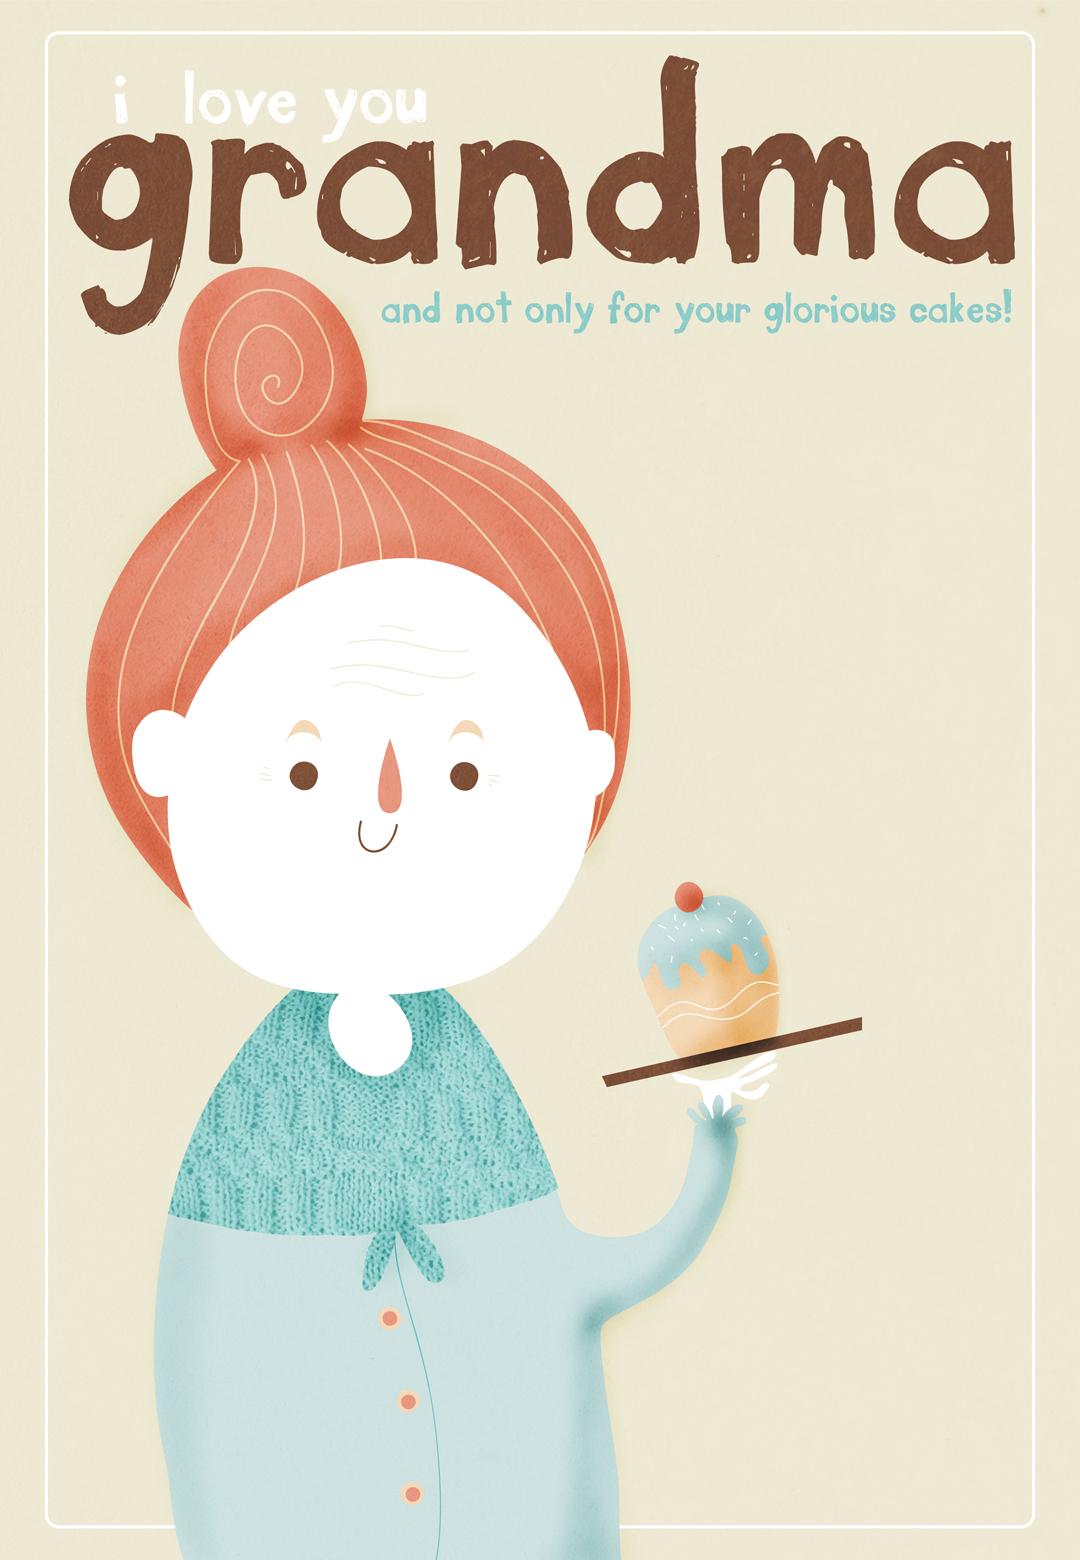 I Love You Grandma - Free Grandperants Day Card   Greetings Island - Christmas Cards For Grandparents Free Printable